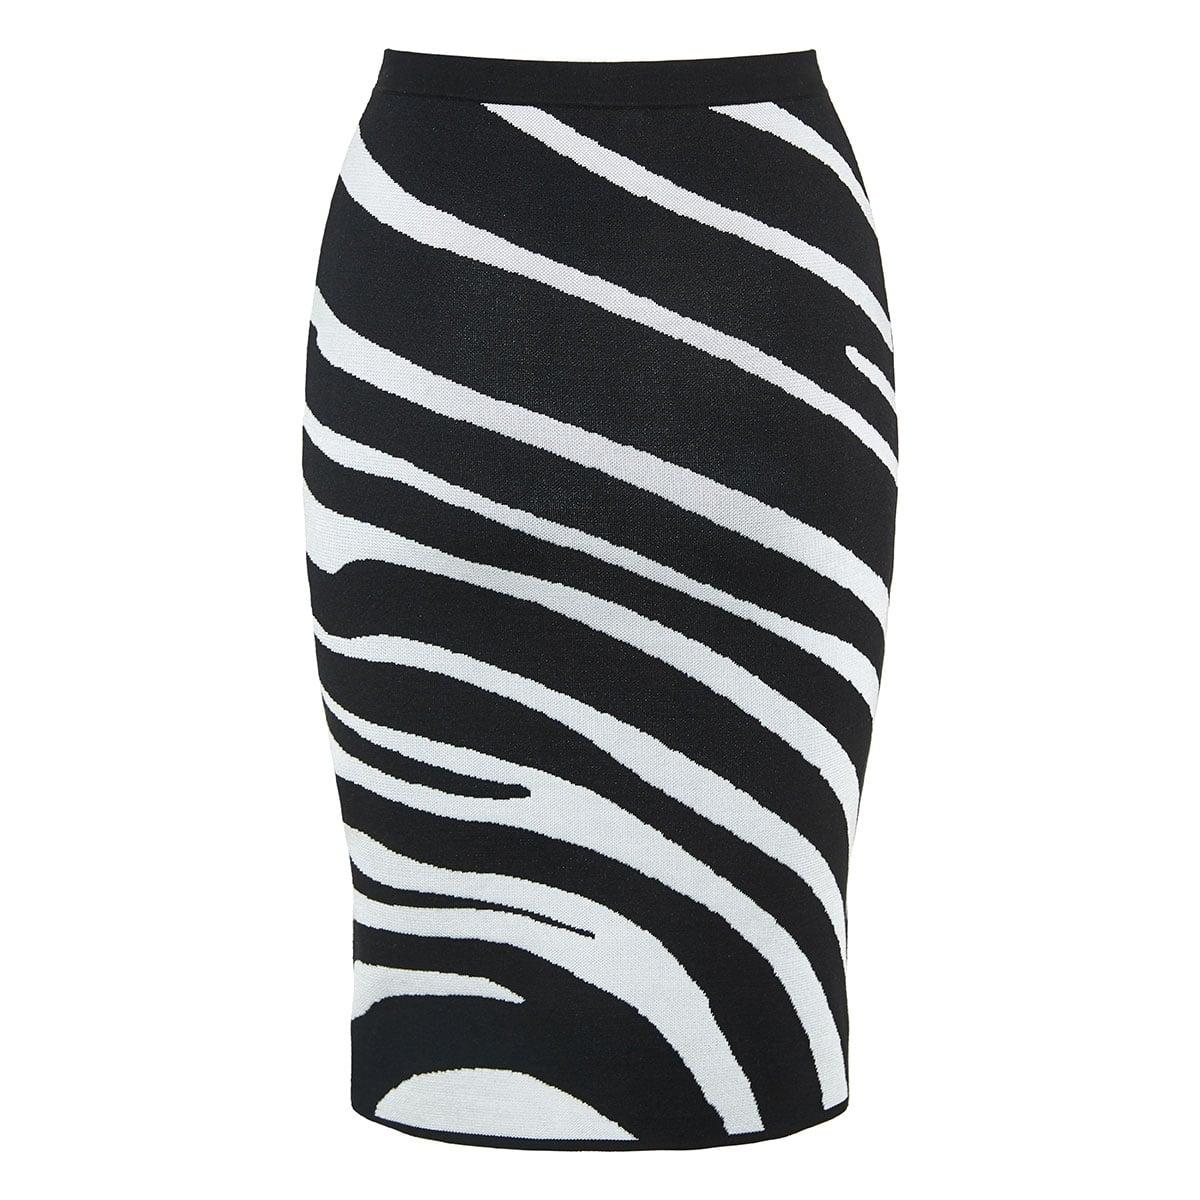 Zebra intarsia knitted pencil skirt